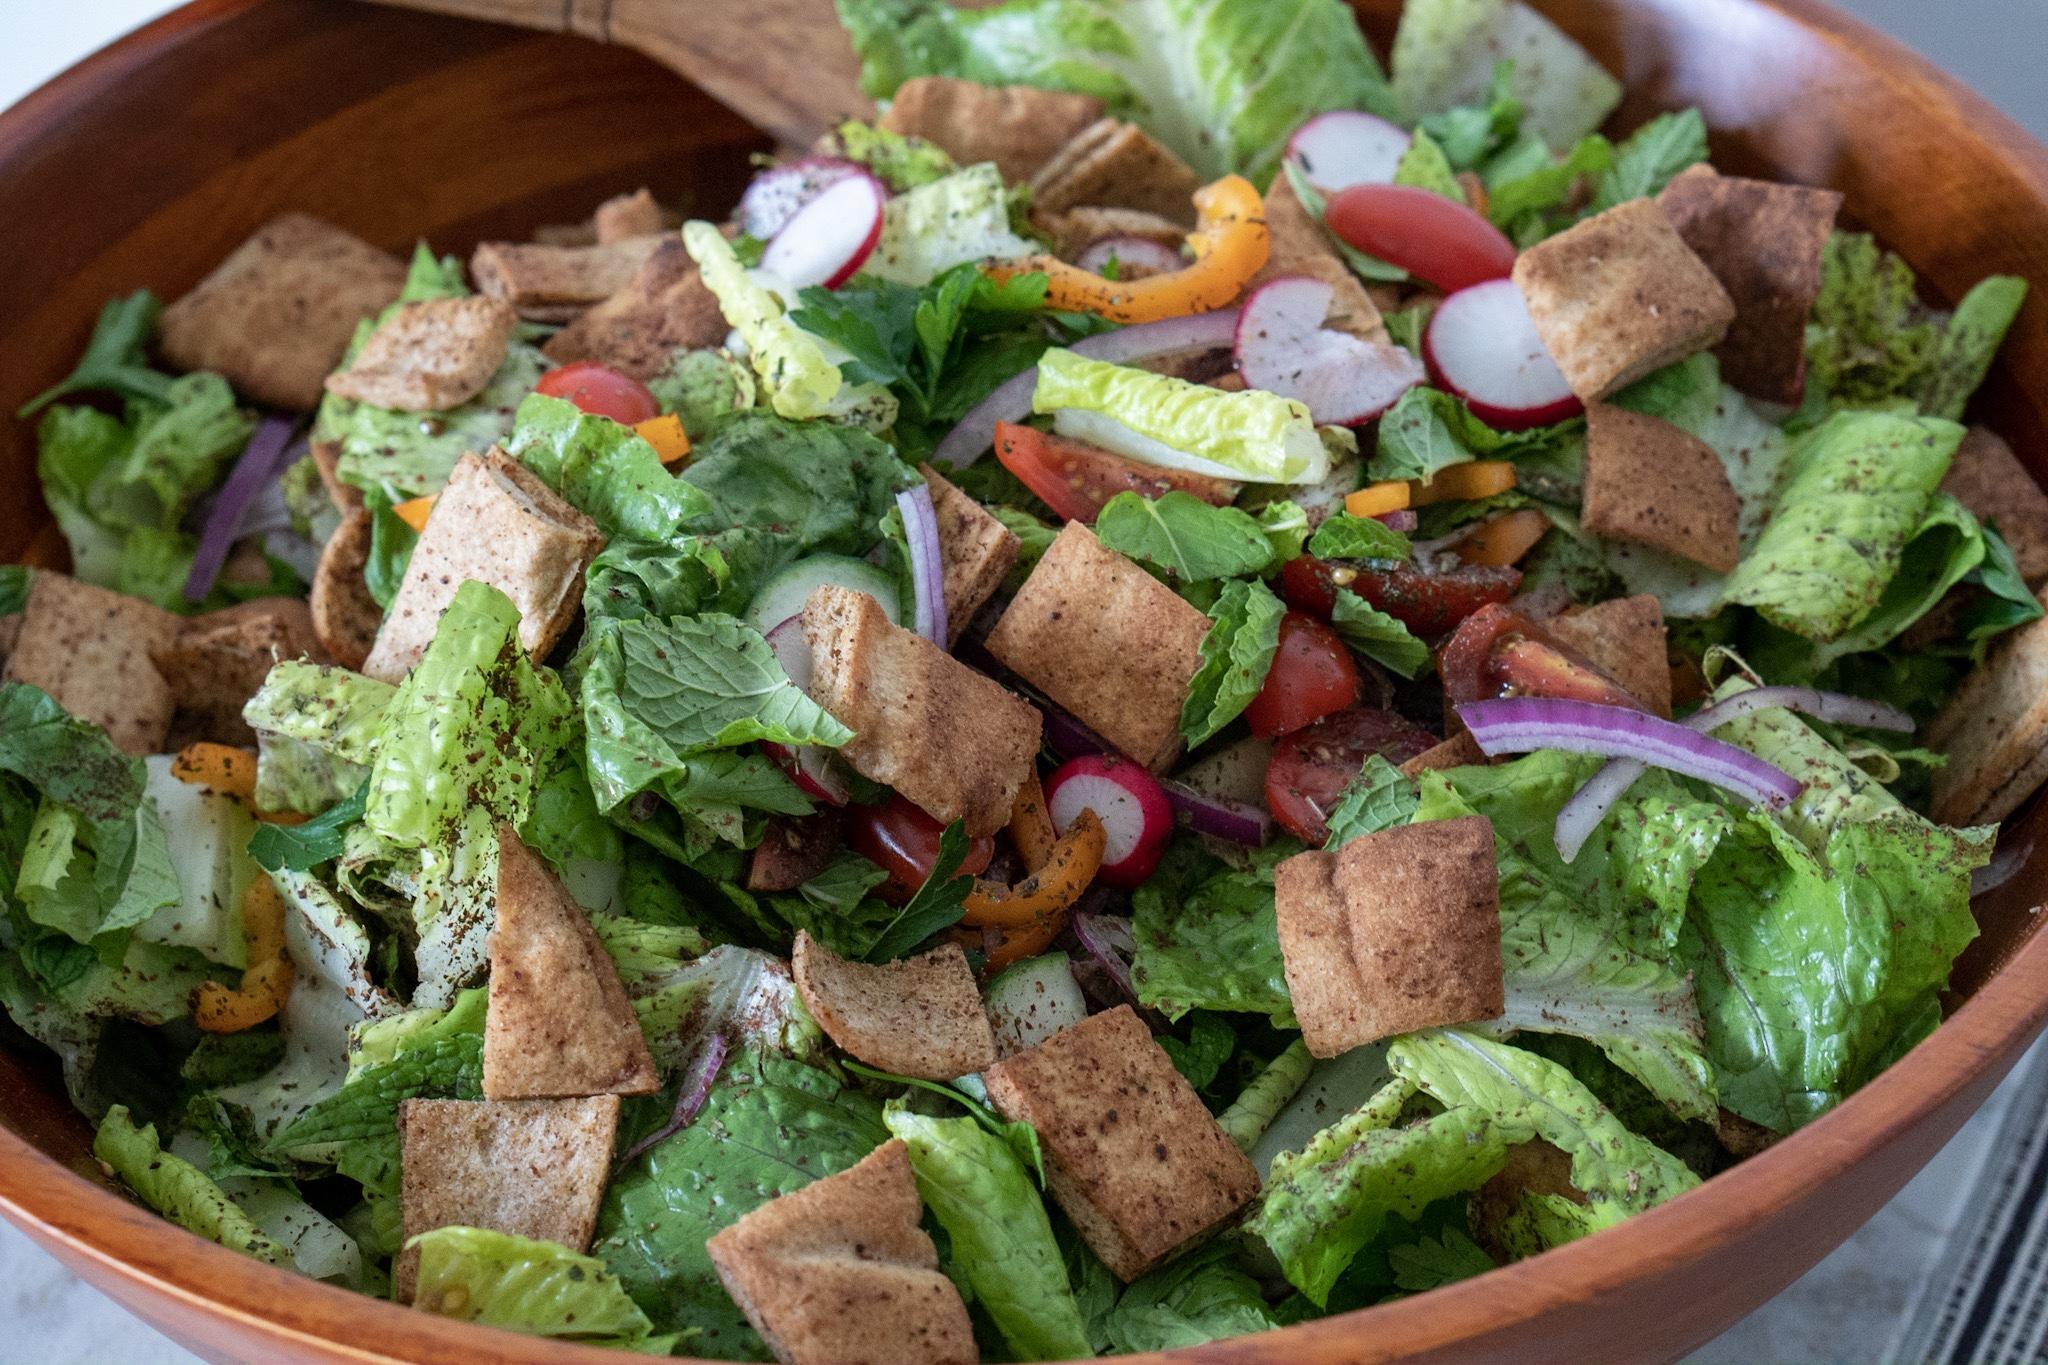 Mixed Fattoush Salad, undressed